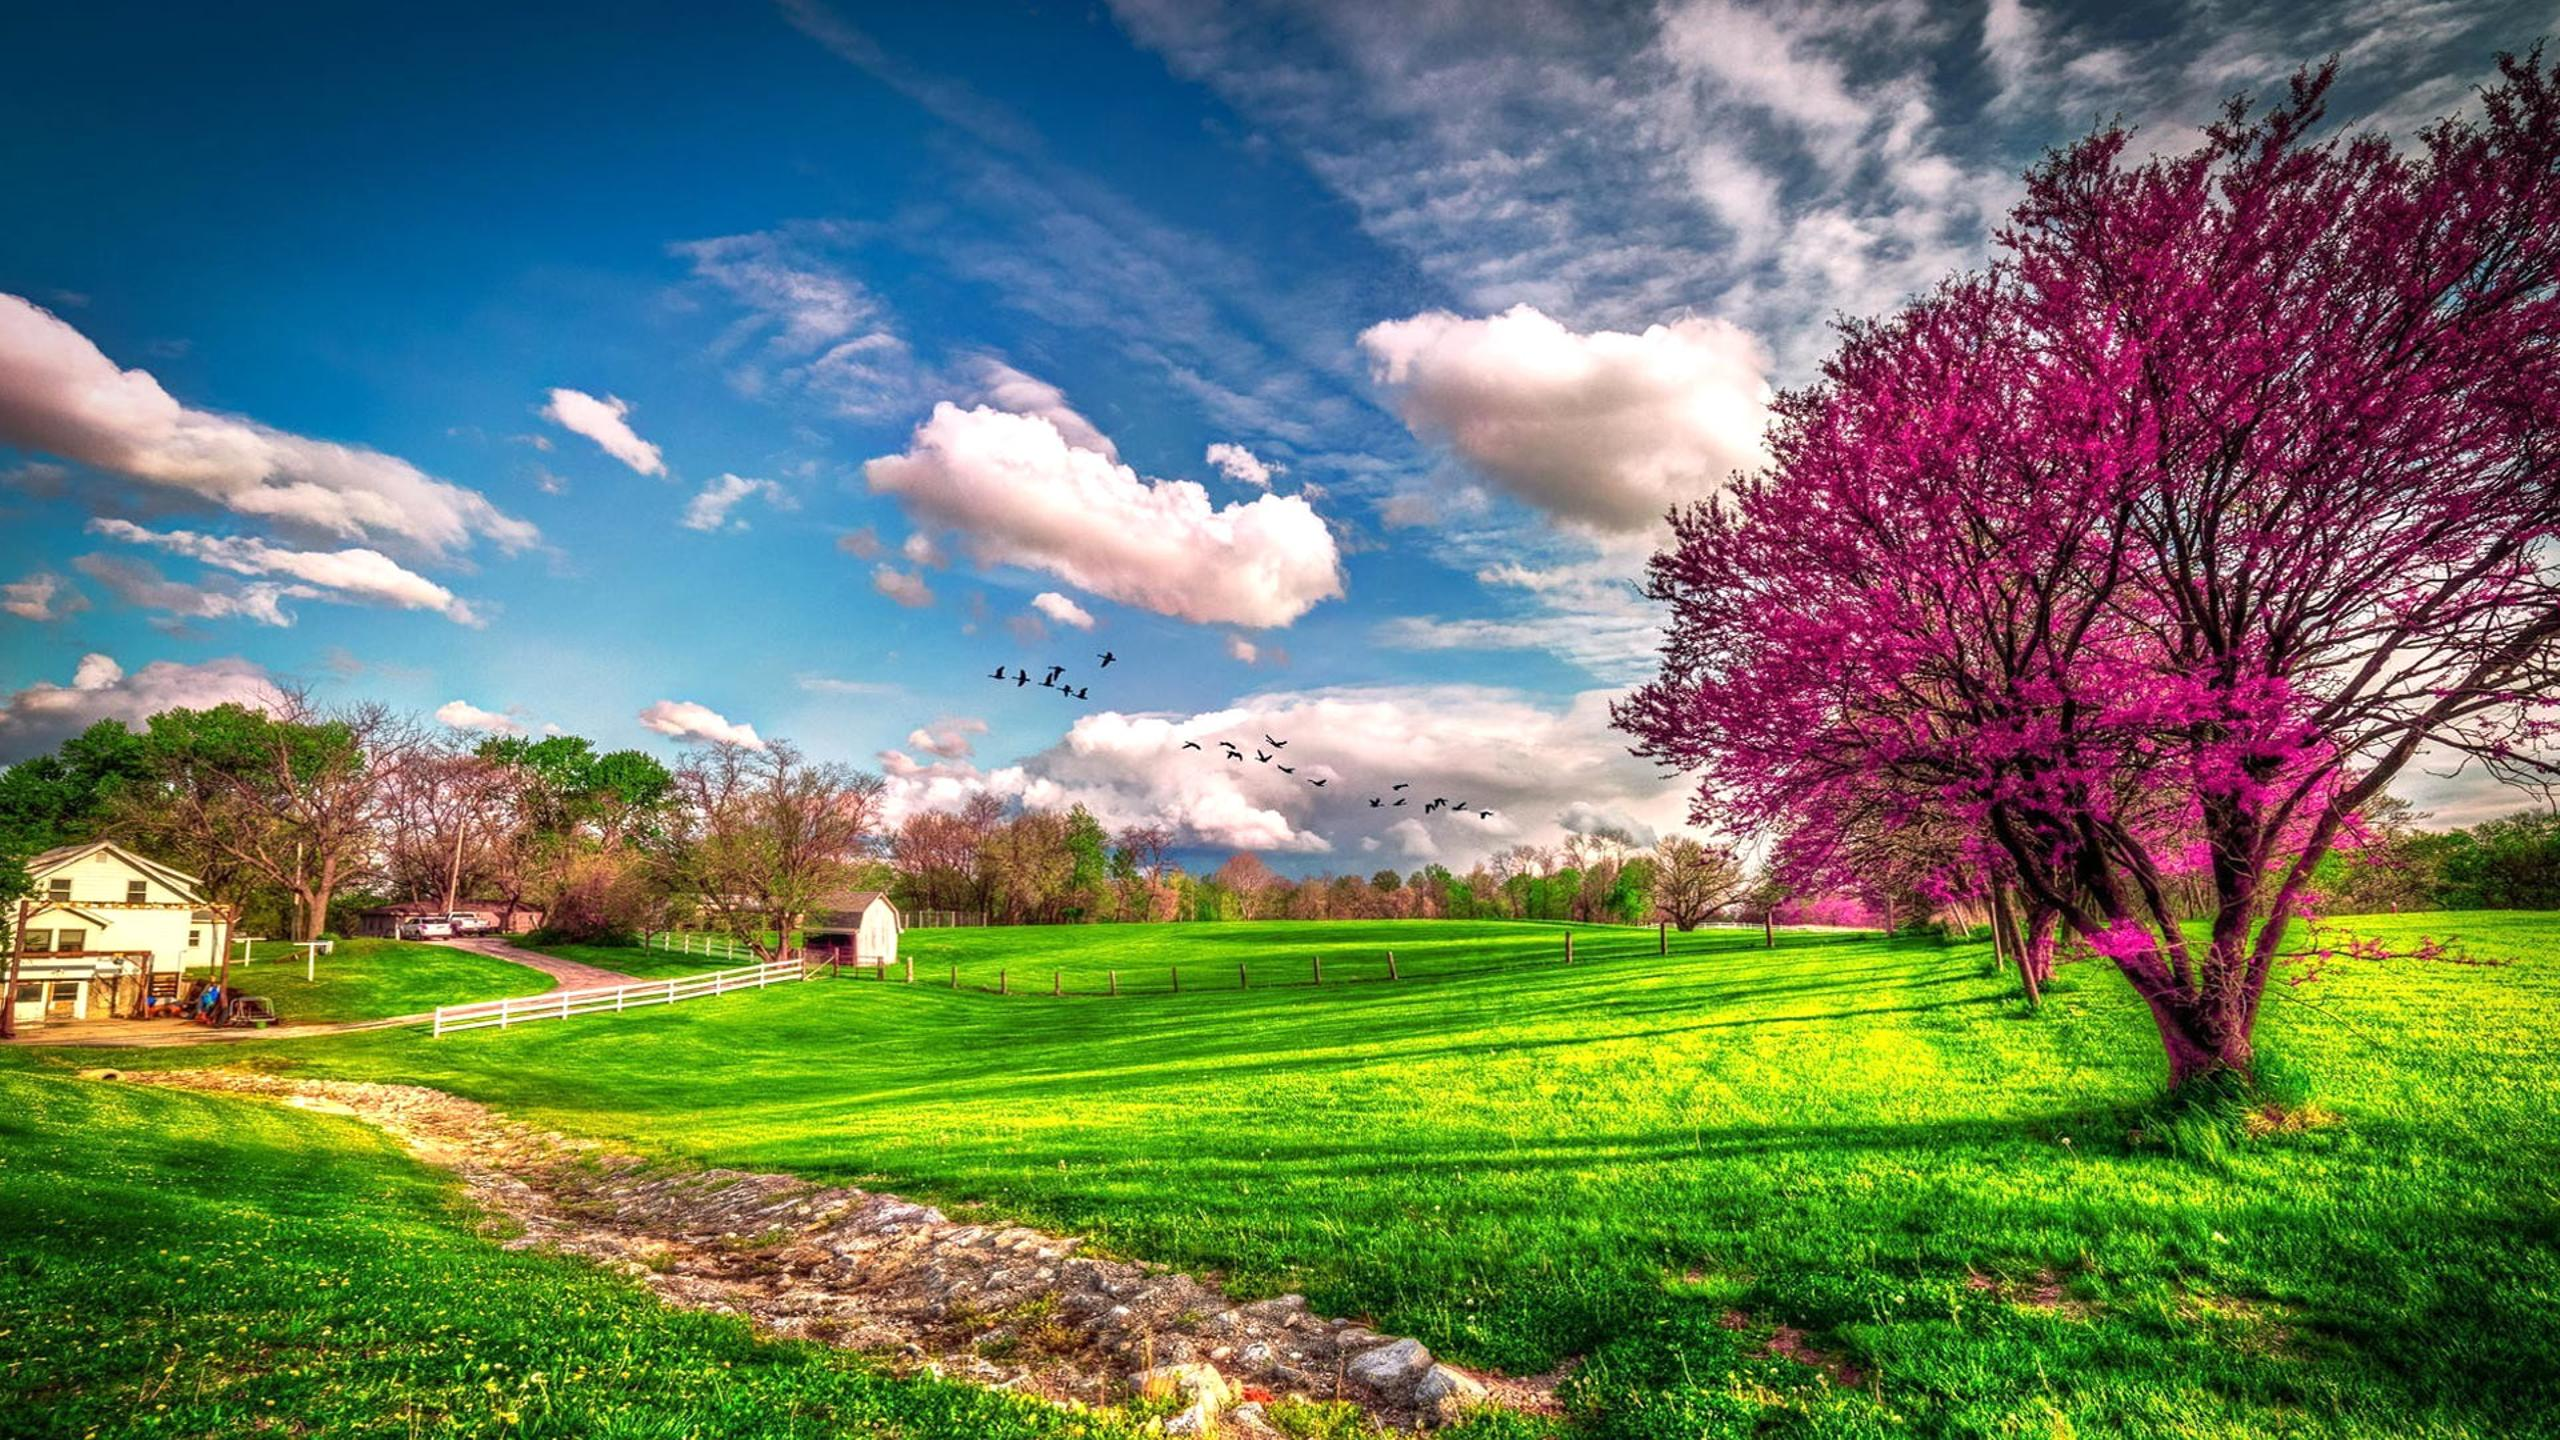 Wonderful Nature Hd Wallpaper: Landscape Beautiful Spring Nature